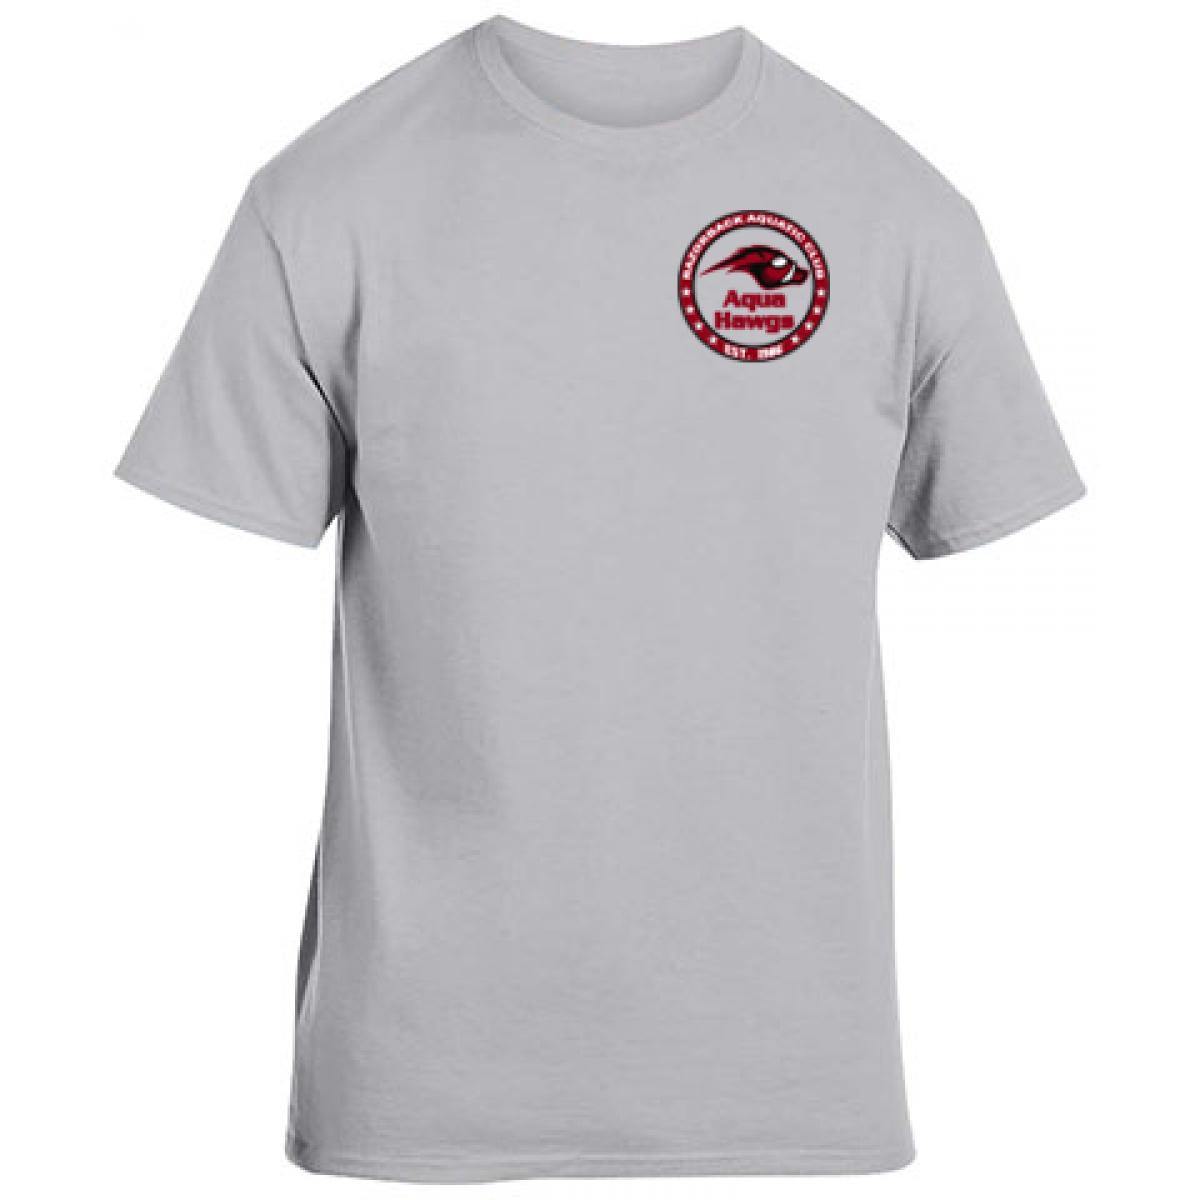 Cotton Short Sleeve T-Shirt Gray-Gray -2XL